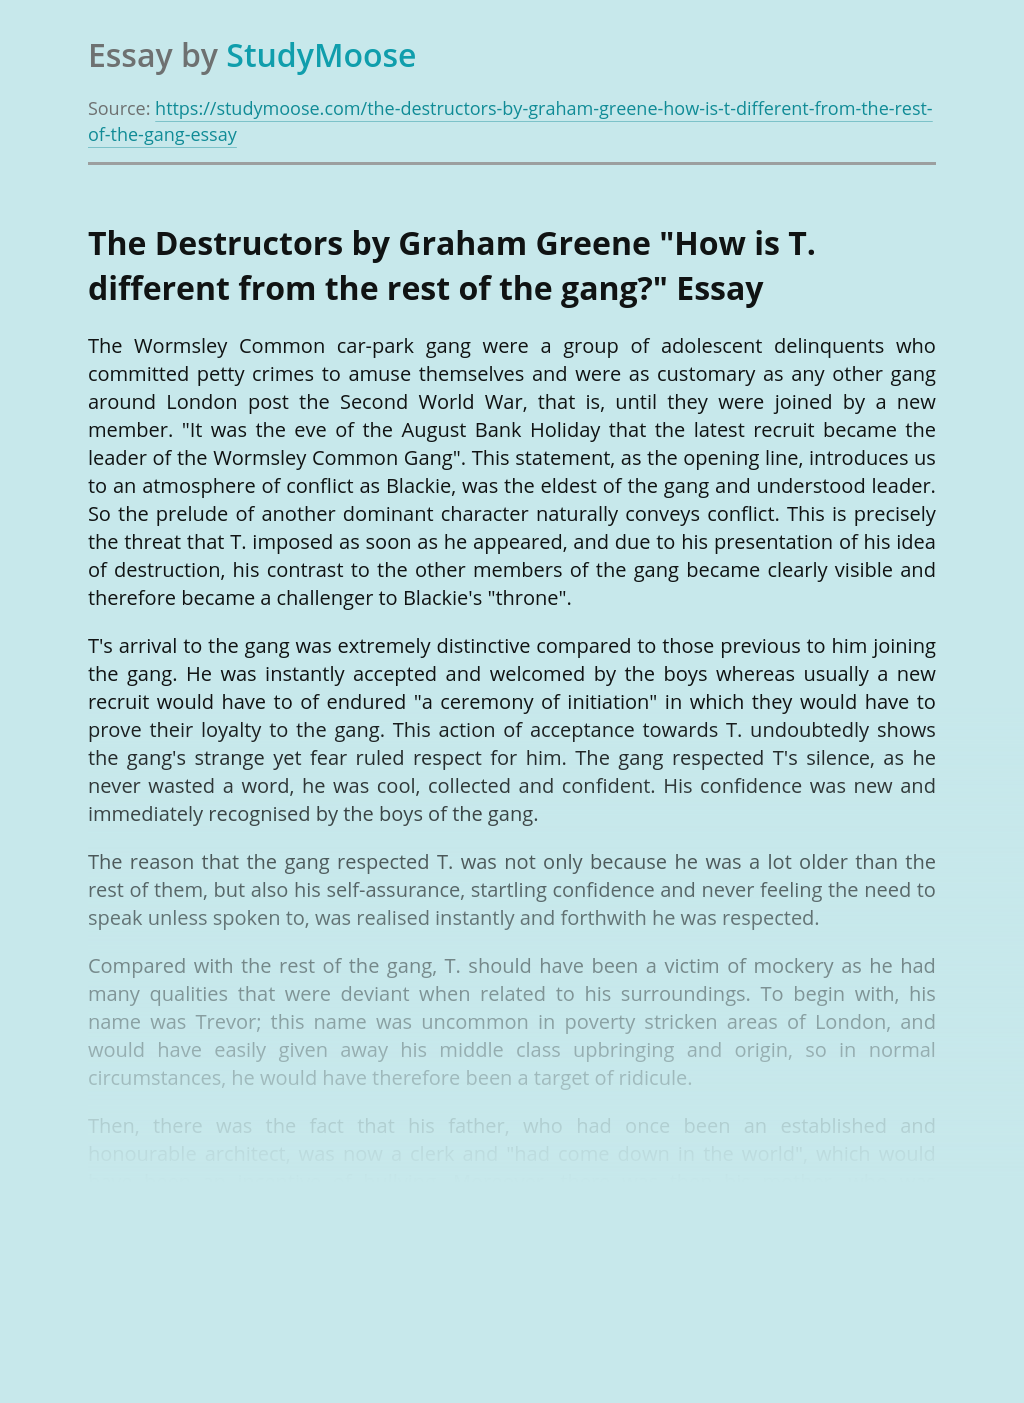 The Destructors by Graham Greene